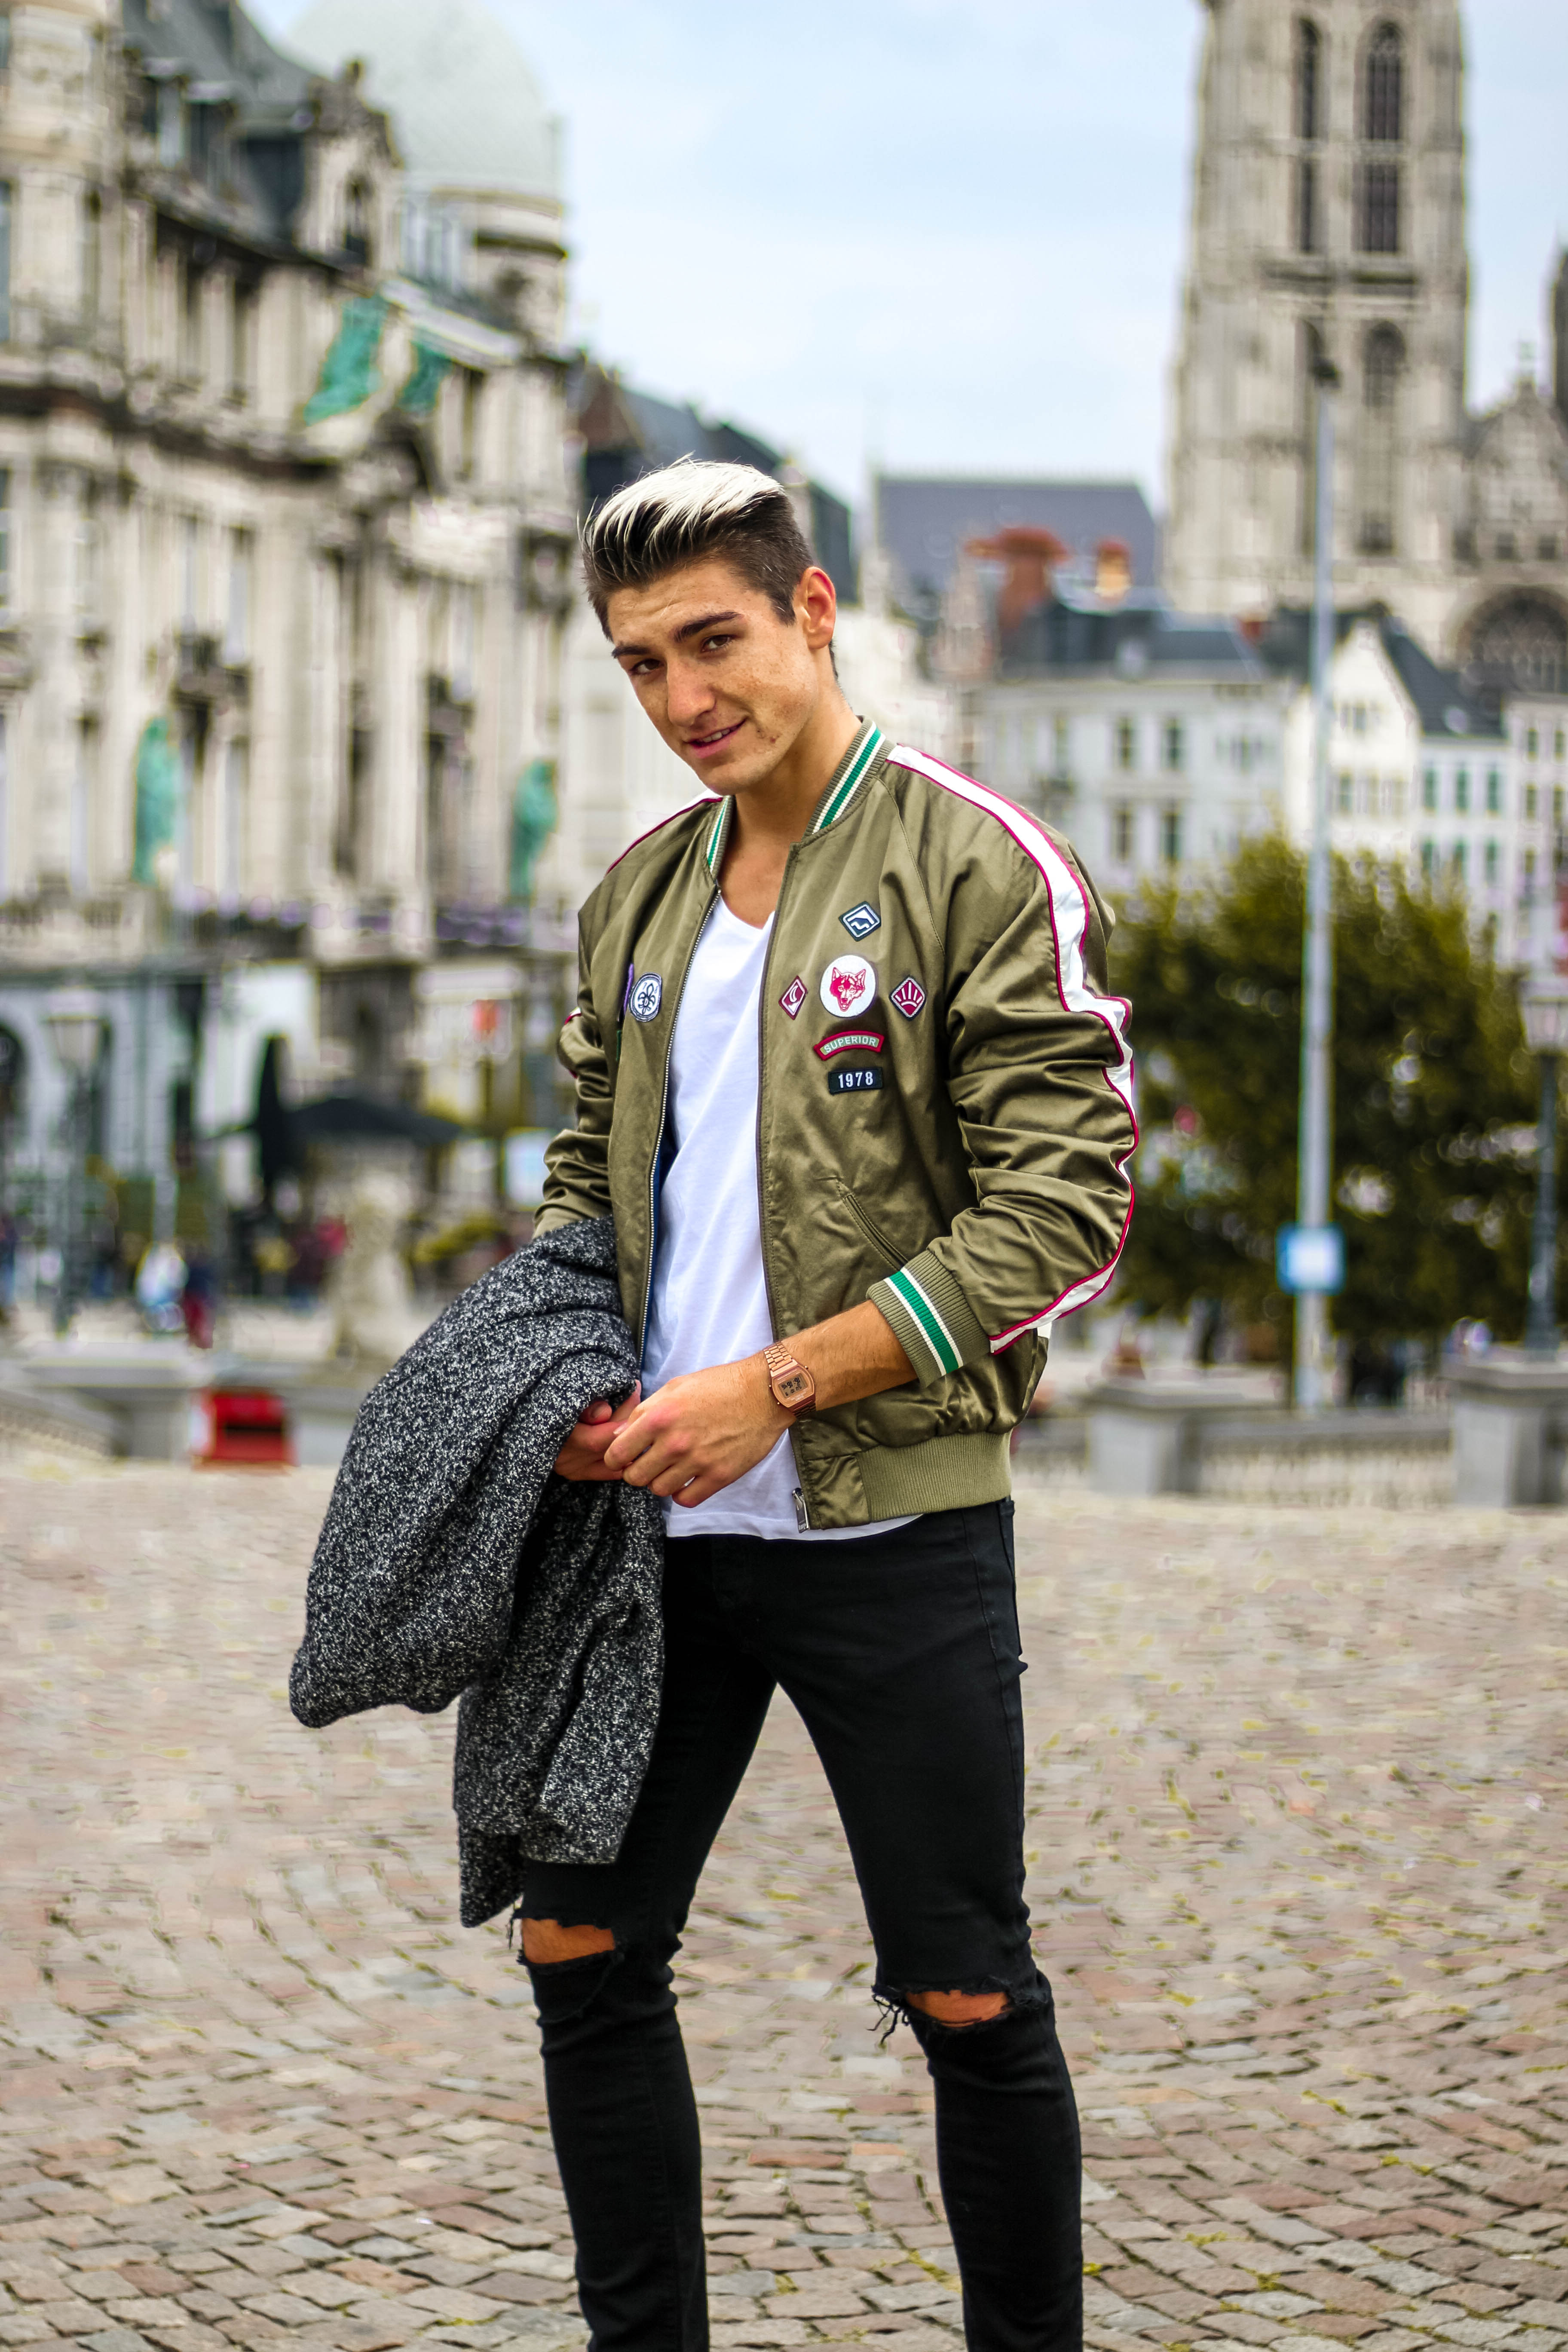 quan jeans rach & bomber photo Ruben Van De Sande - elle man 1